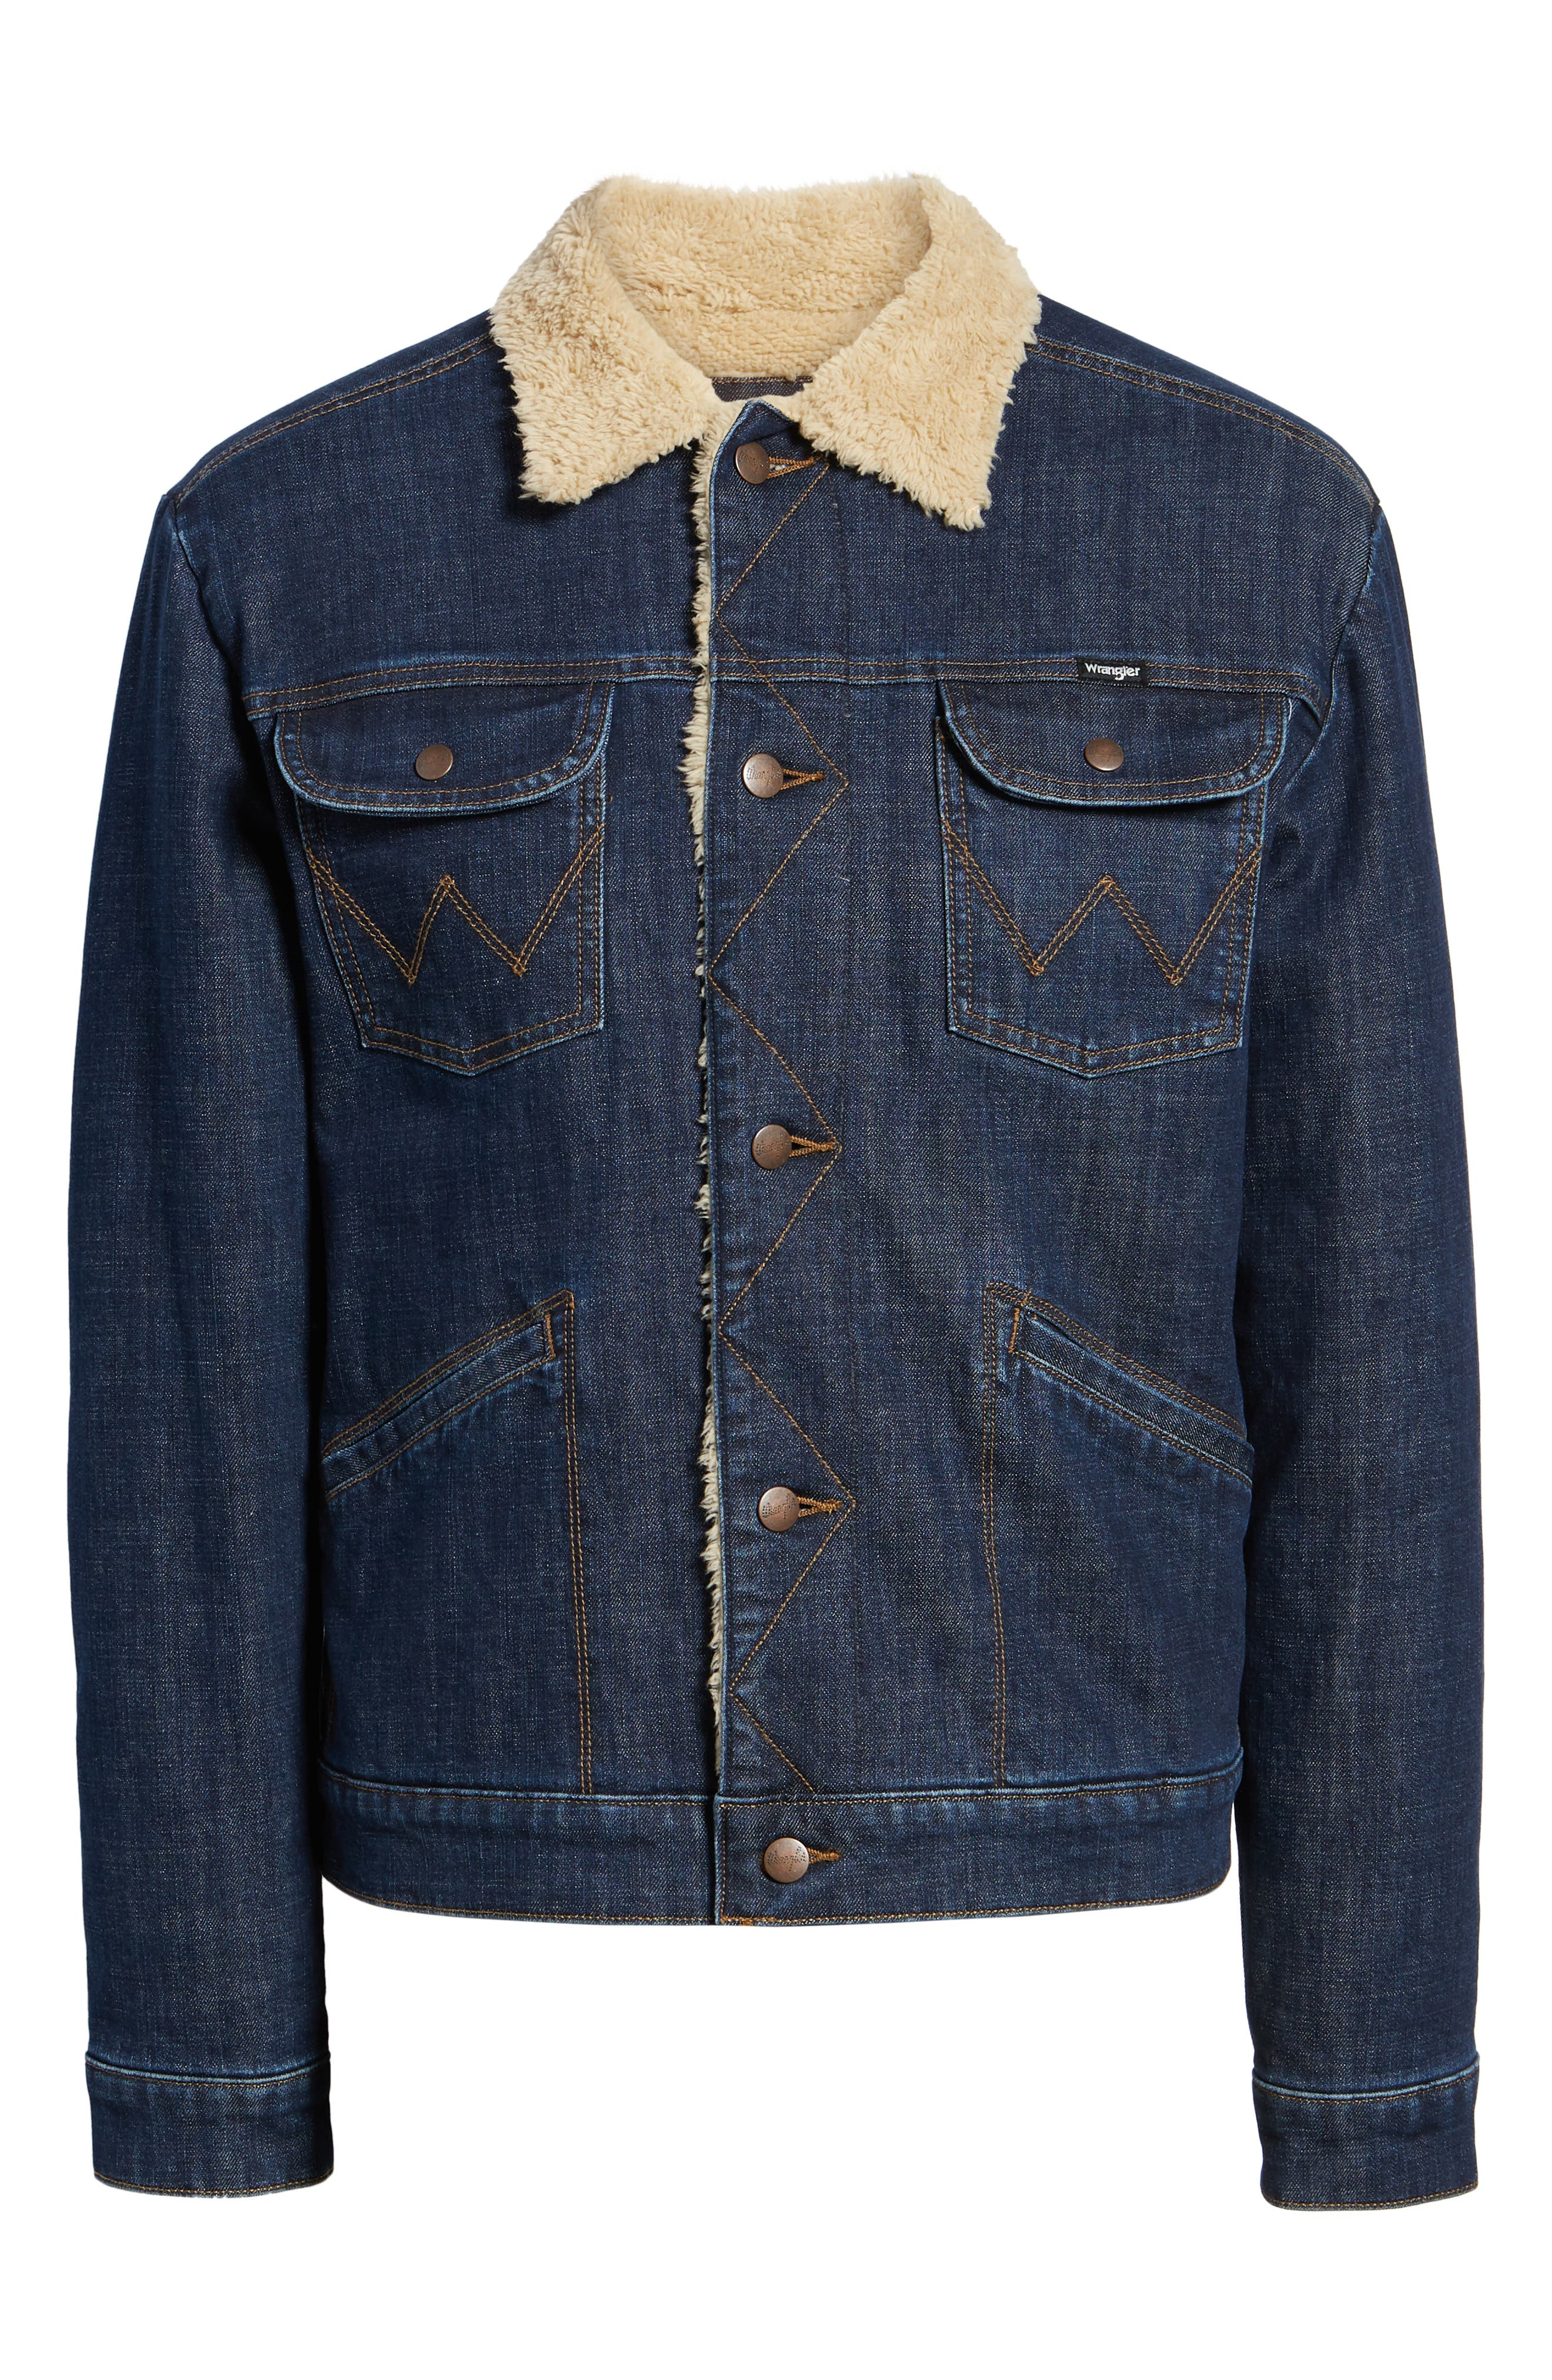 WRANGLER, Heritage Fleece Lined Denim Jacket, Alternate thumbnail 6, color, 472